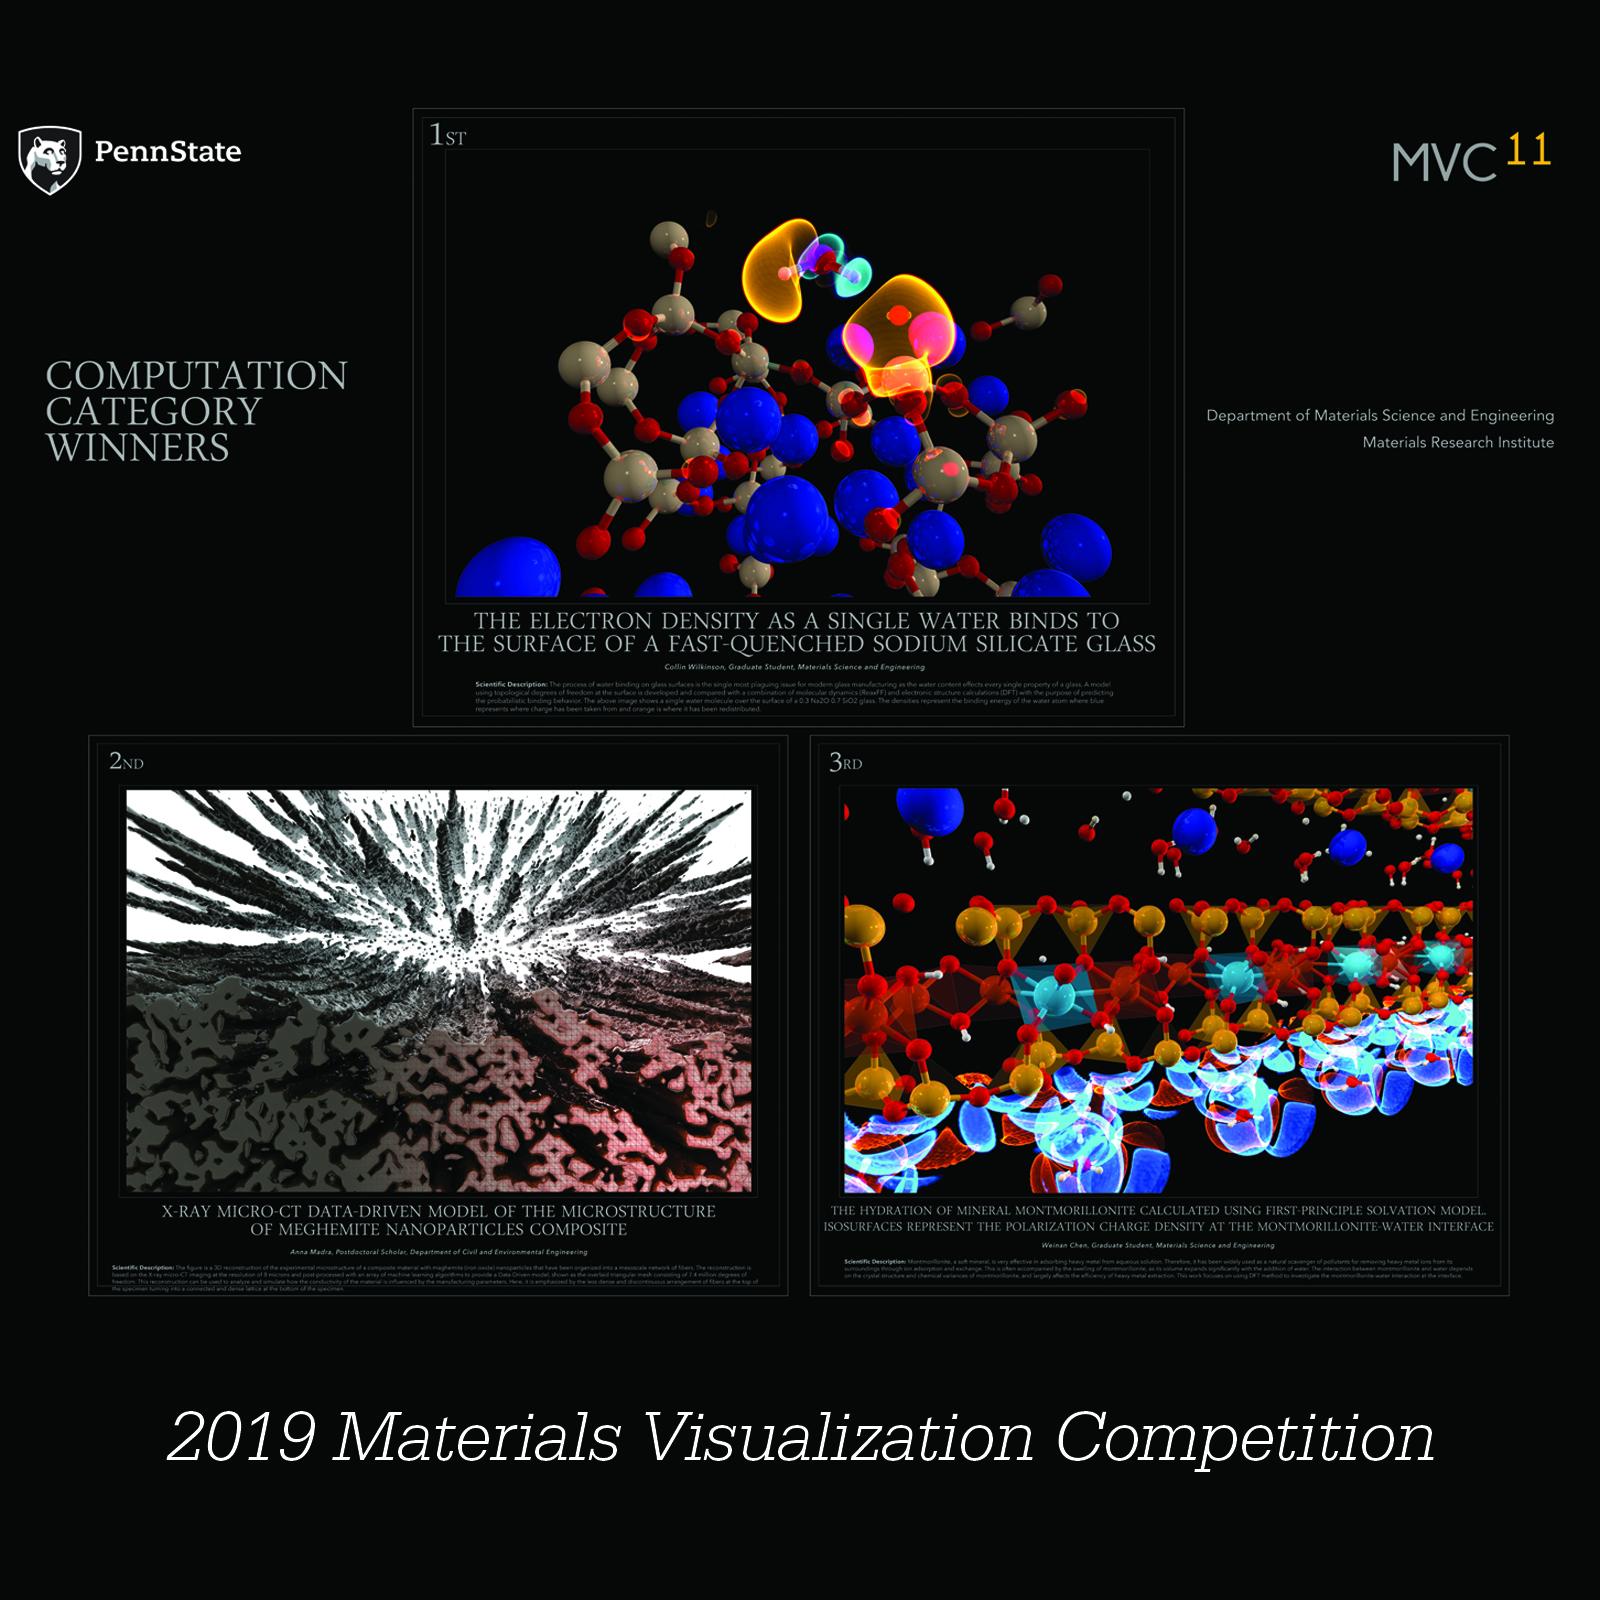 MVC11 Computation Winners